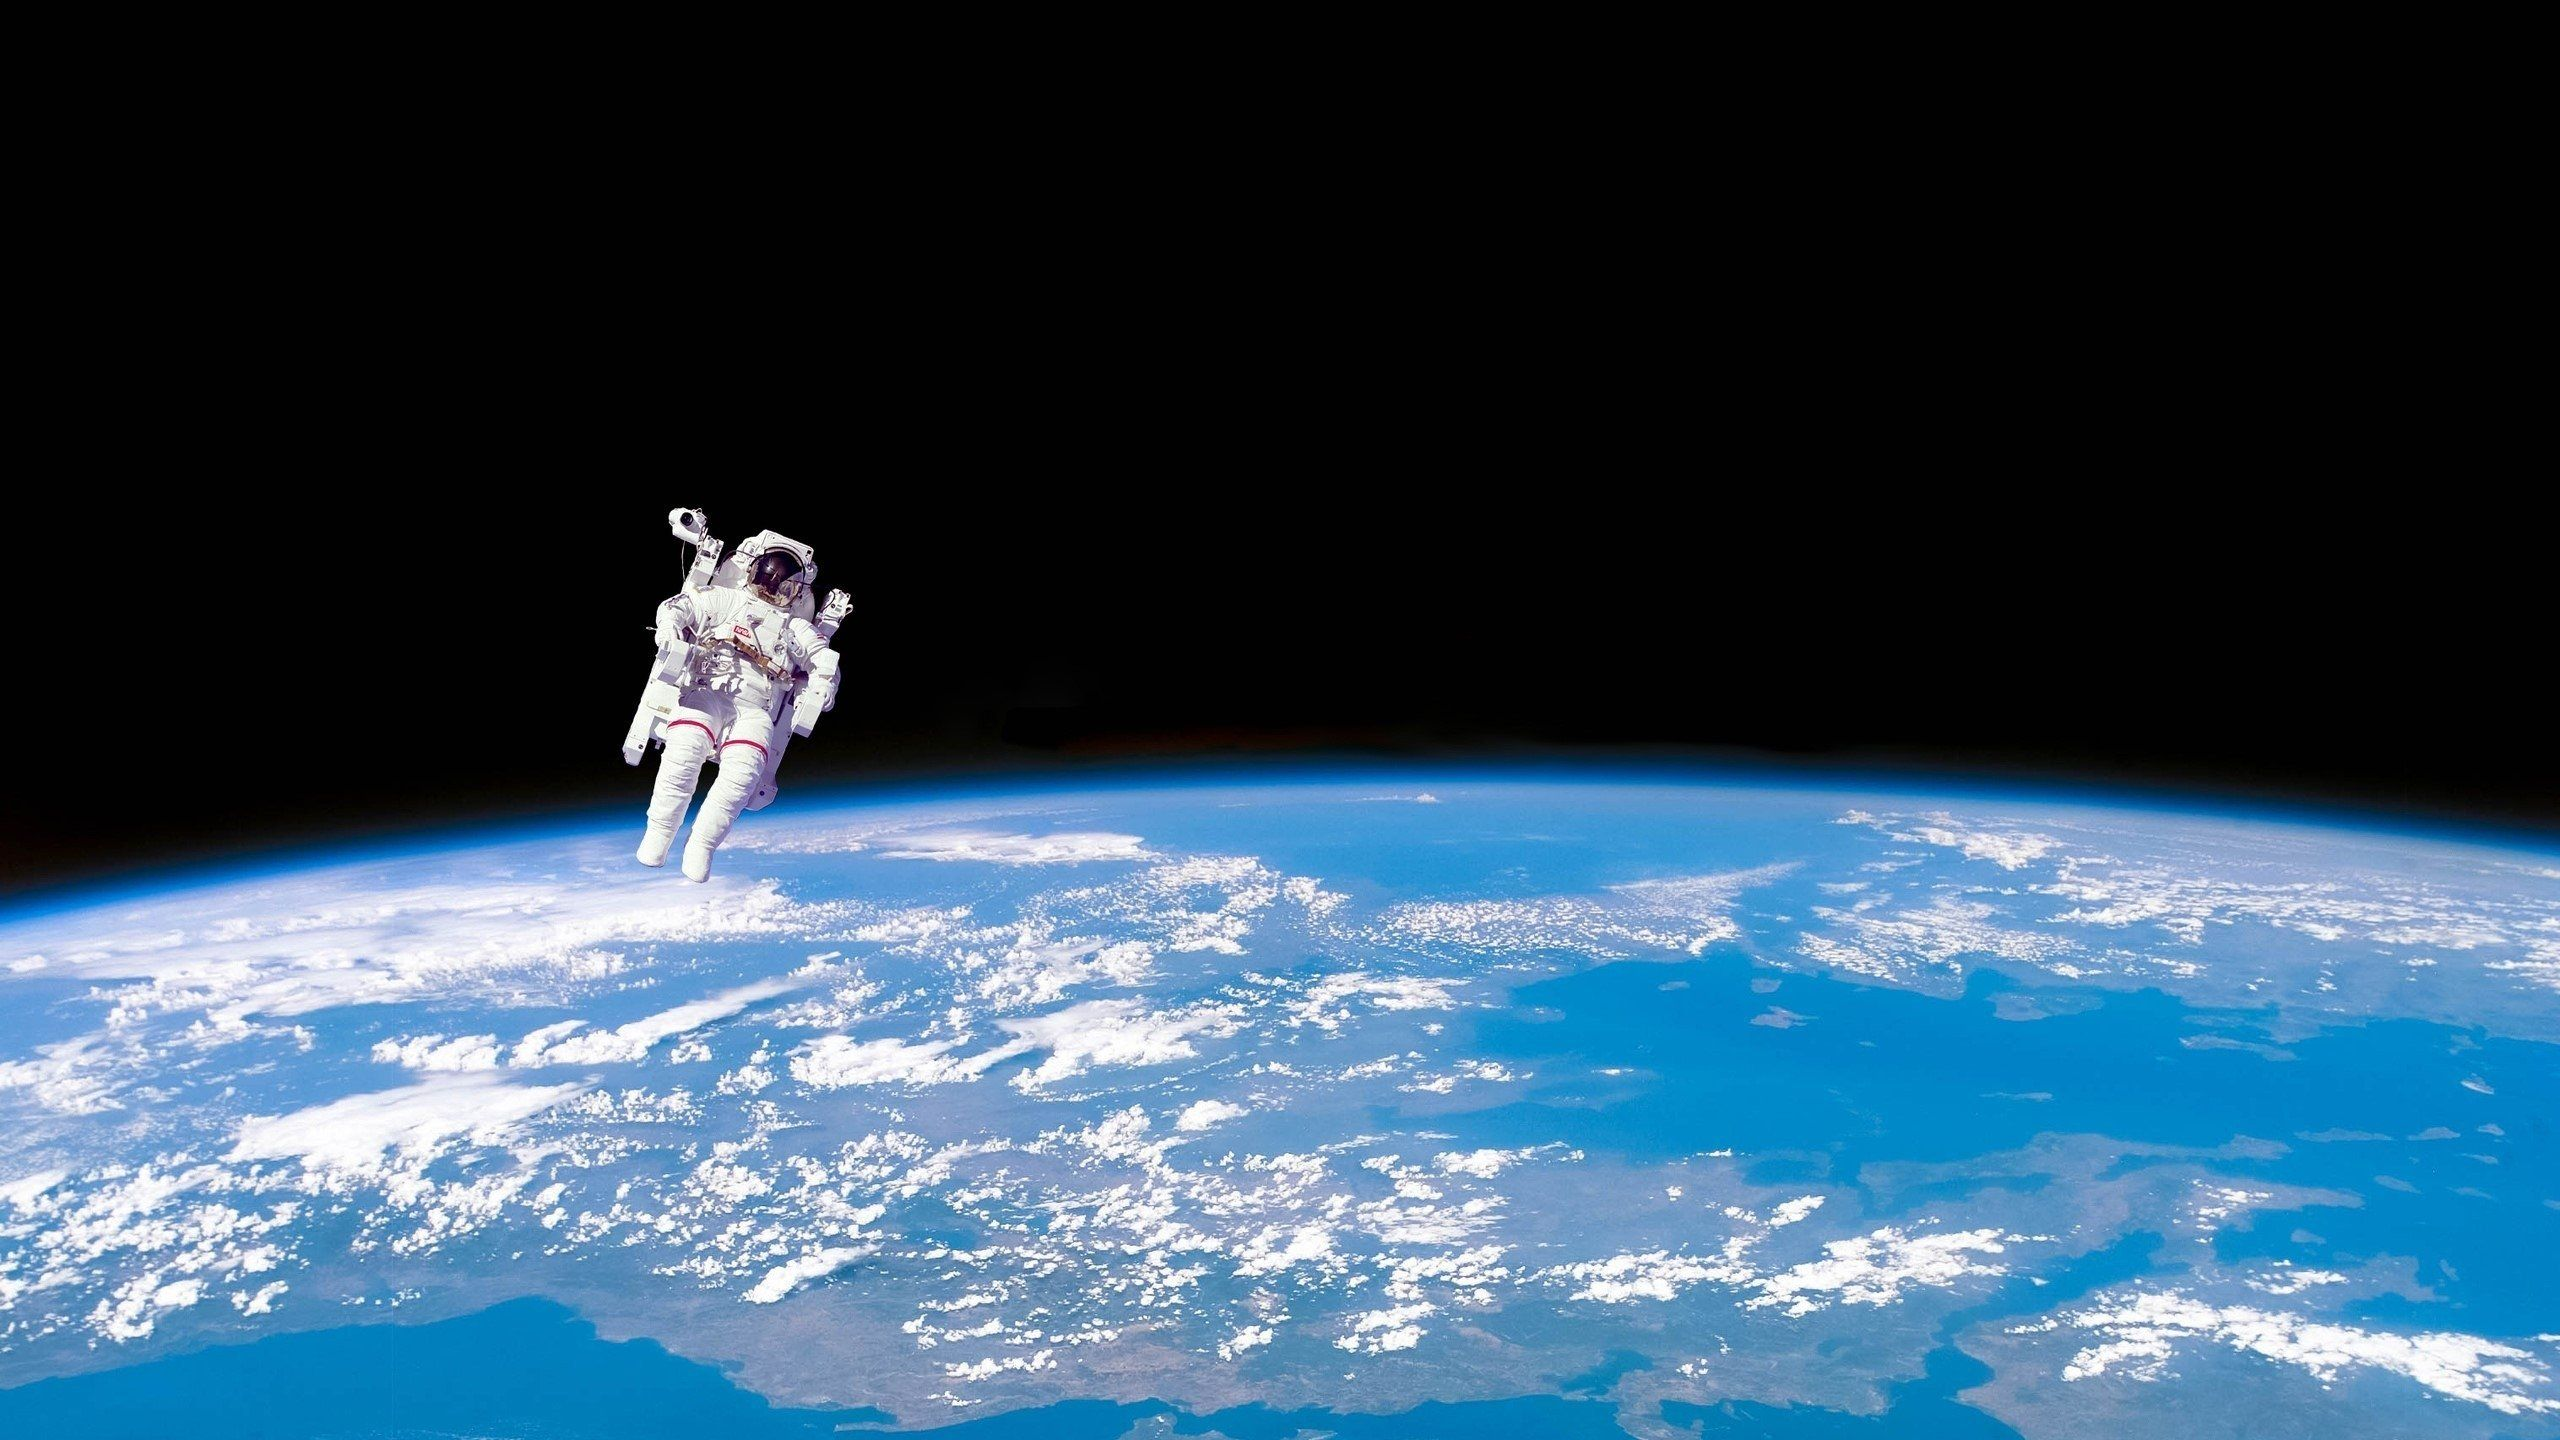 Astronauts On The Moon Hd Wallpaper Astronaut Wallpaper Beer Wallpaper Wallpaper